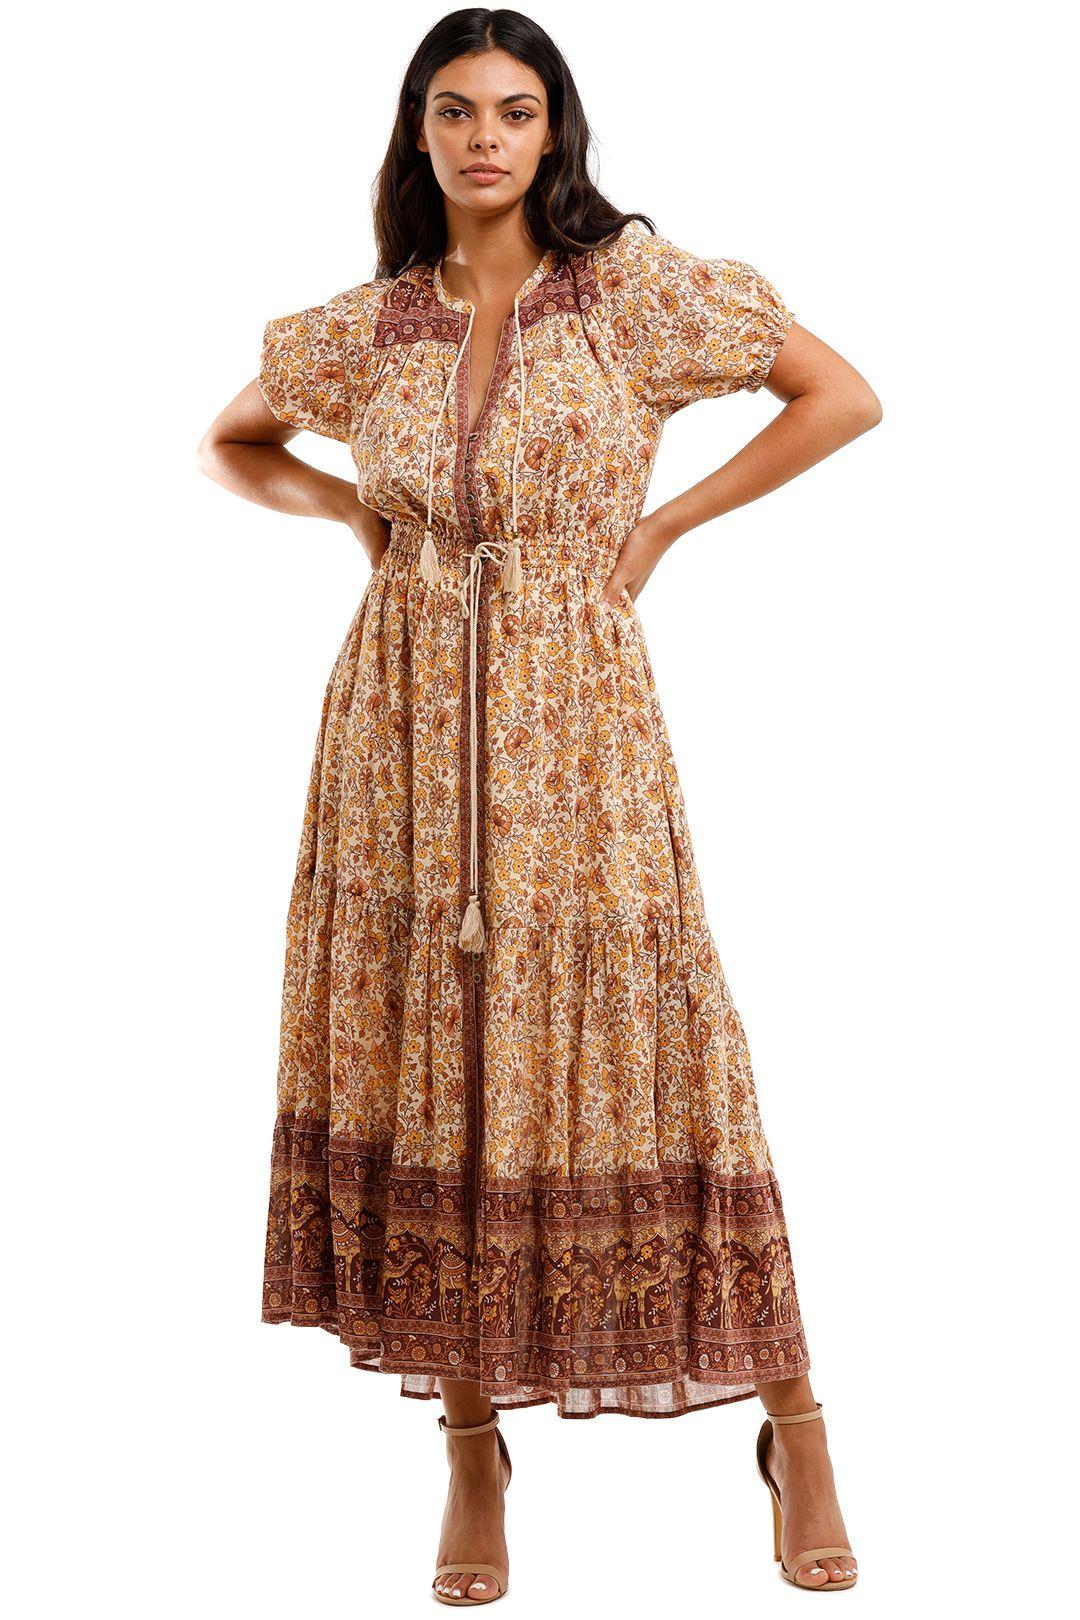 Spell Sundown Gown Spice maxi Dress